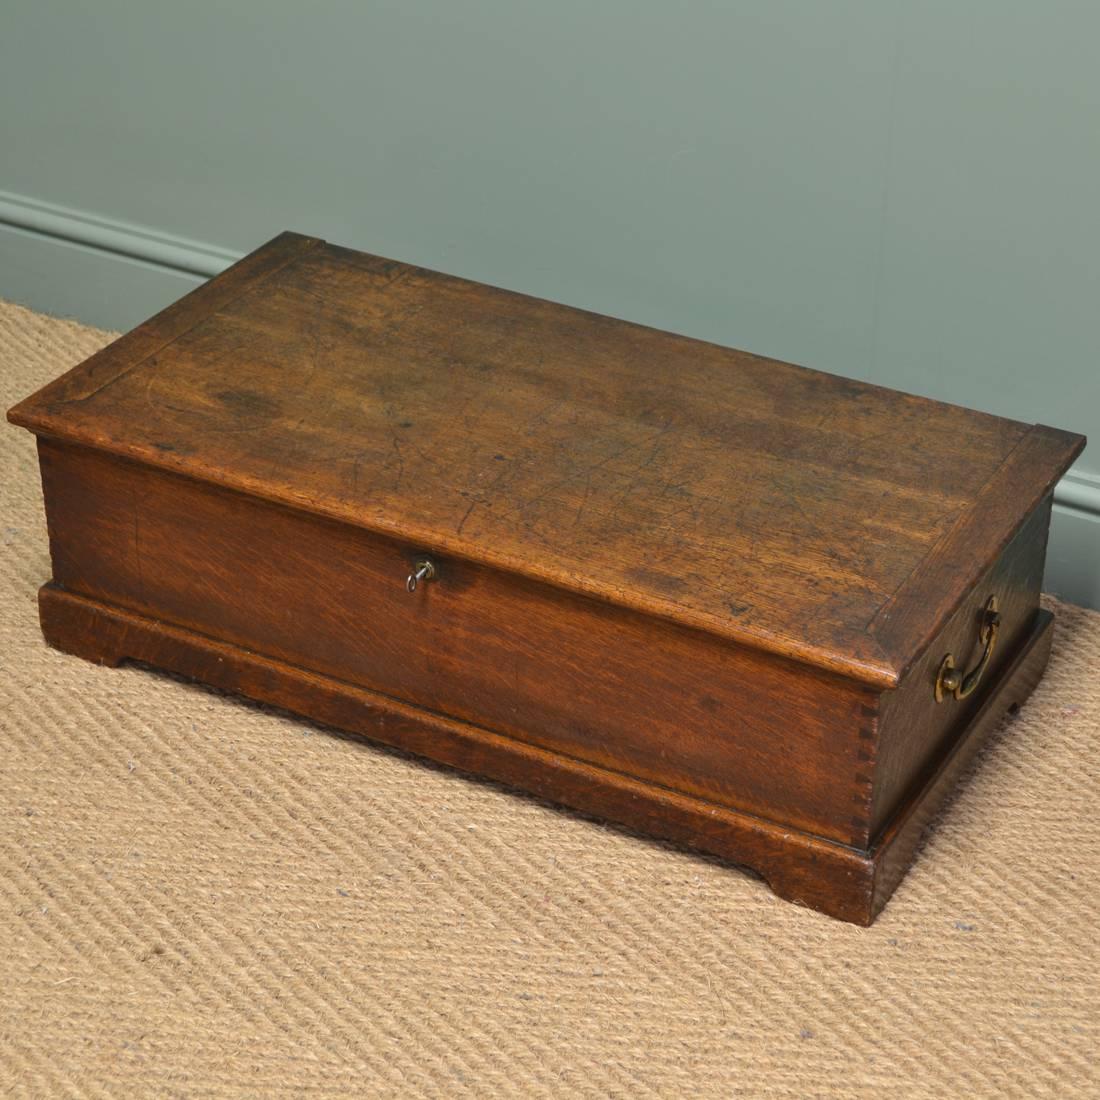 Period Georgian Oak Low Antique Coffer / Coffee Table - Antiques World in Low Oak Coffee Tables (Image 14 of 15)